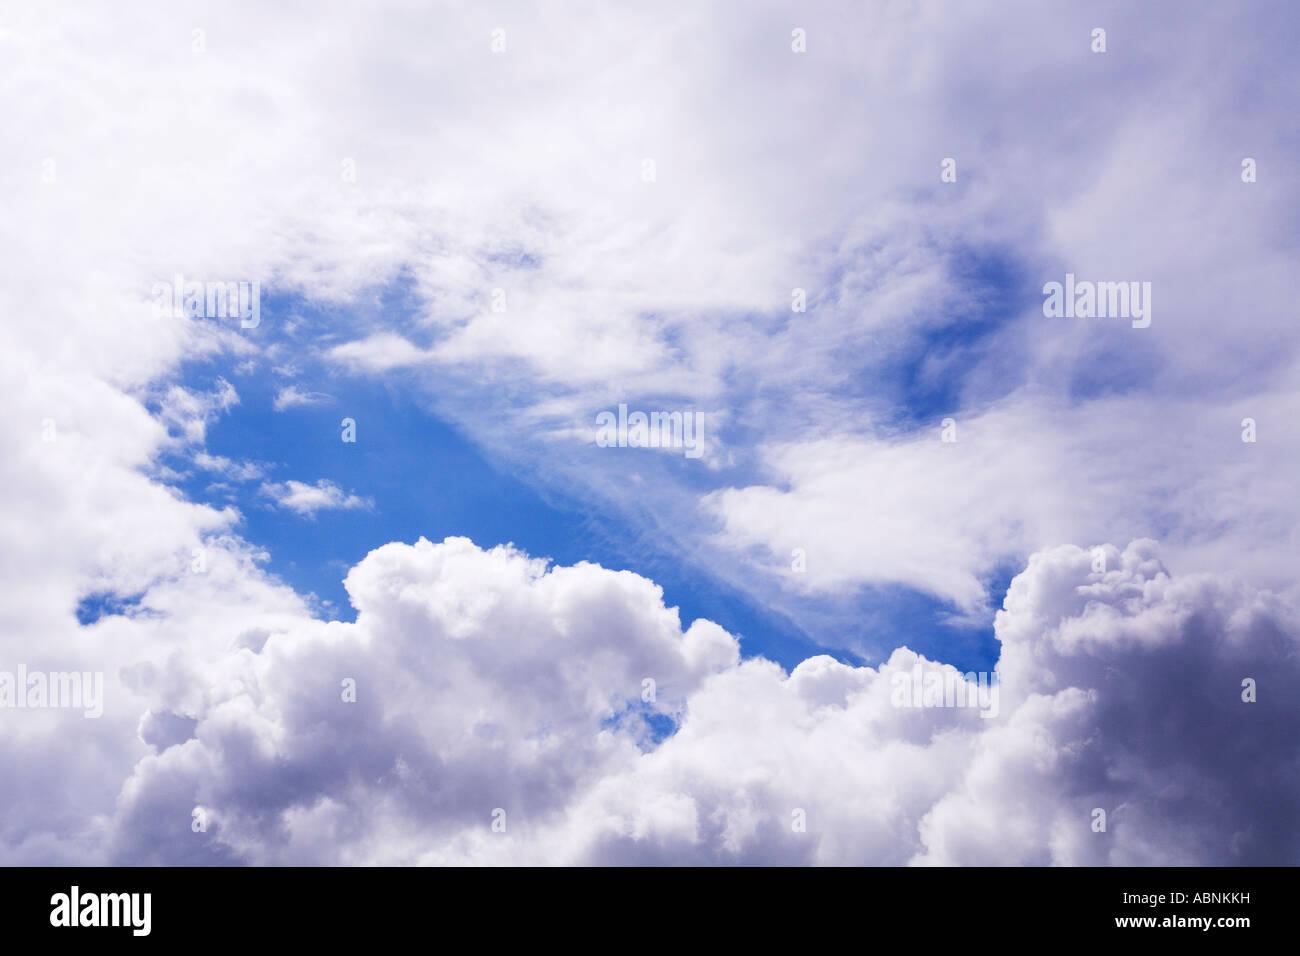 Blue sky nuvole bianche atmosfera Bianco cielo altitudine altocumulus altostratus cirrocumulus cirrostratus cirrus Immagini Stock